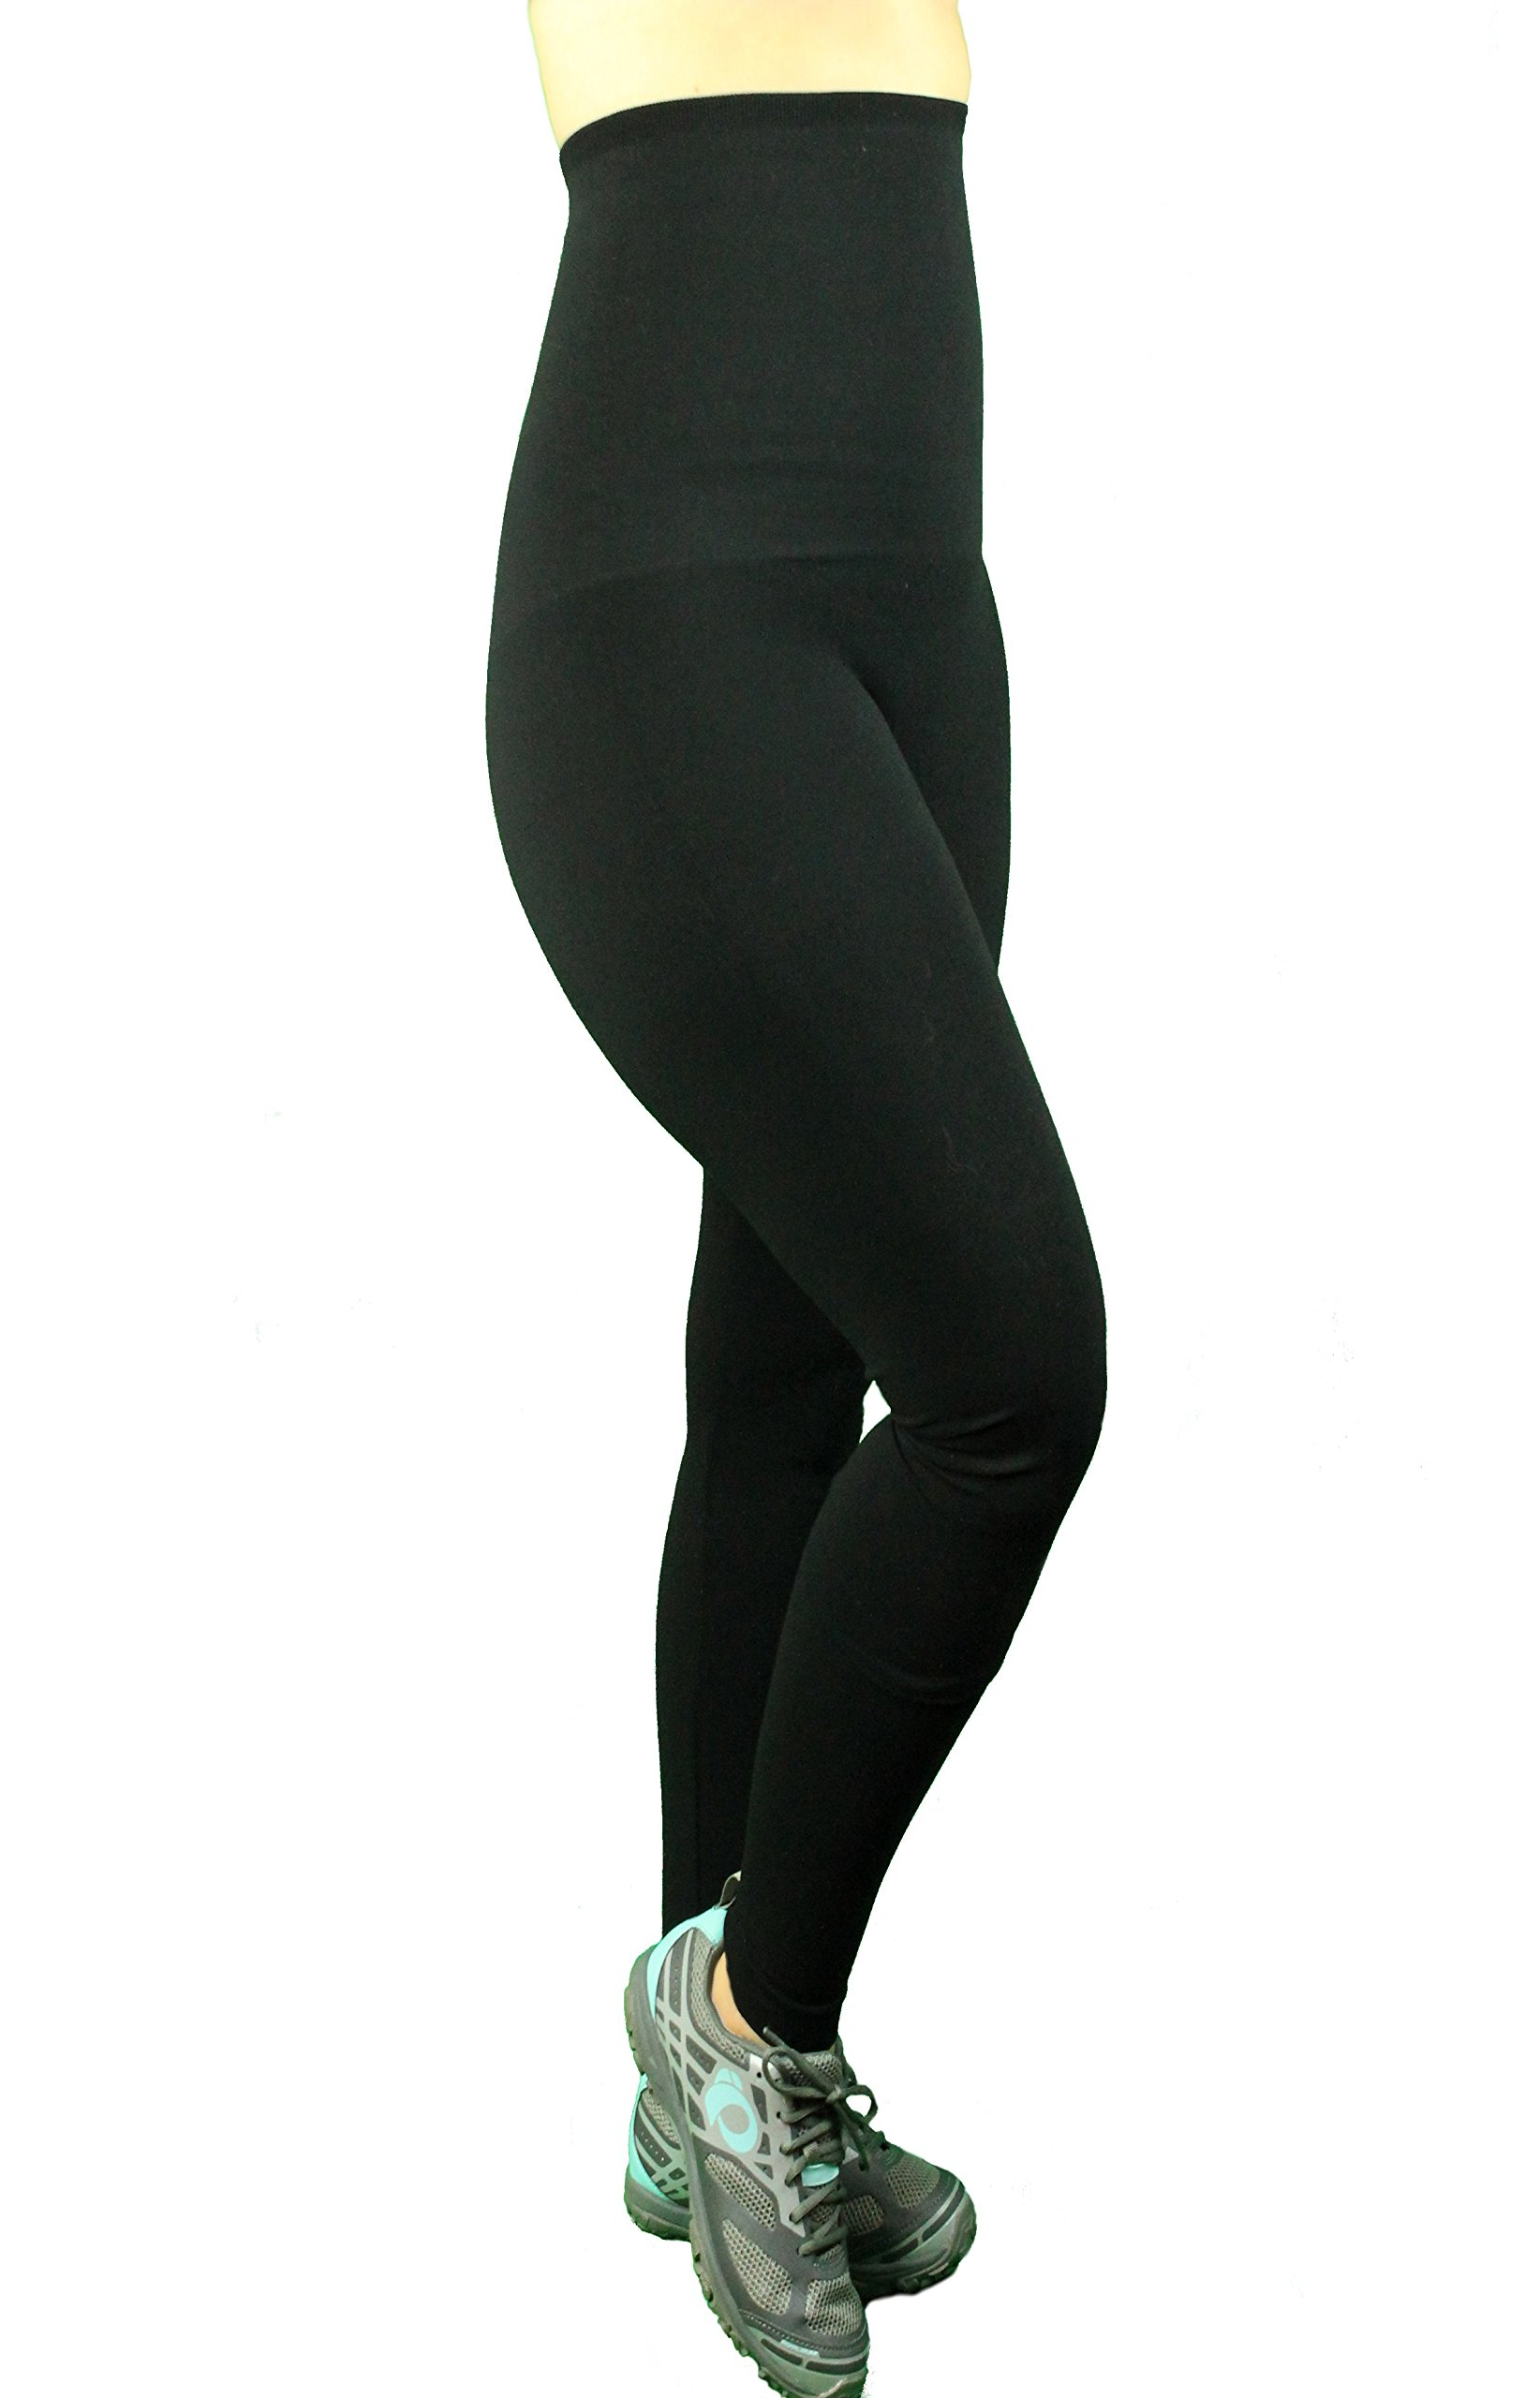 Mothers Essentials Postpartum High Waist Tummy Compression Control Slimming Leggings (Large, Black)